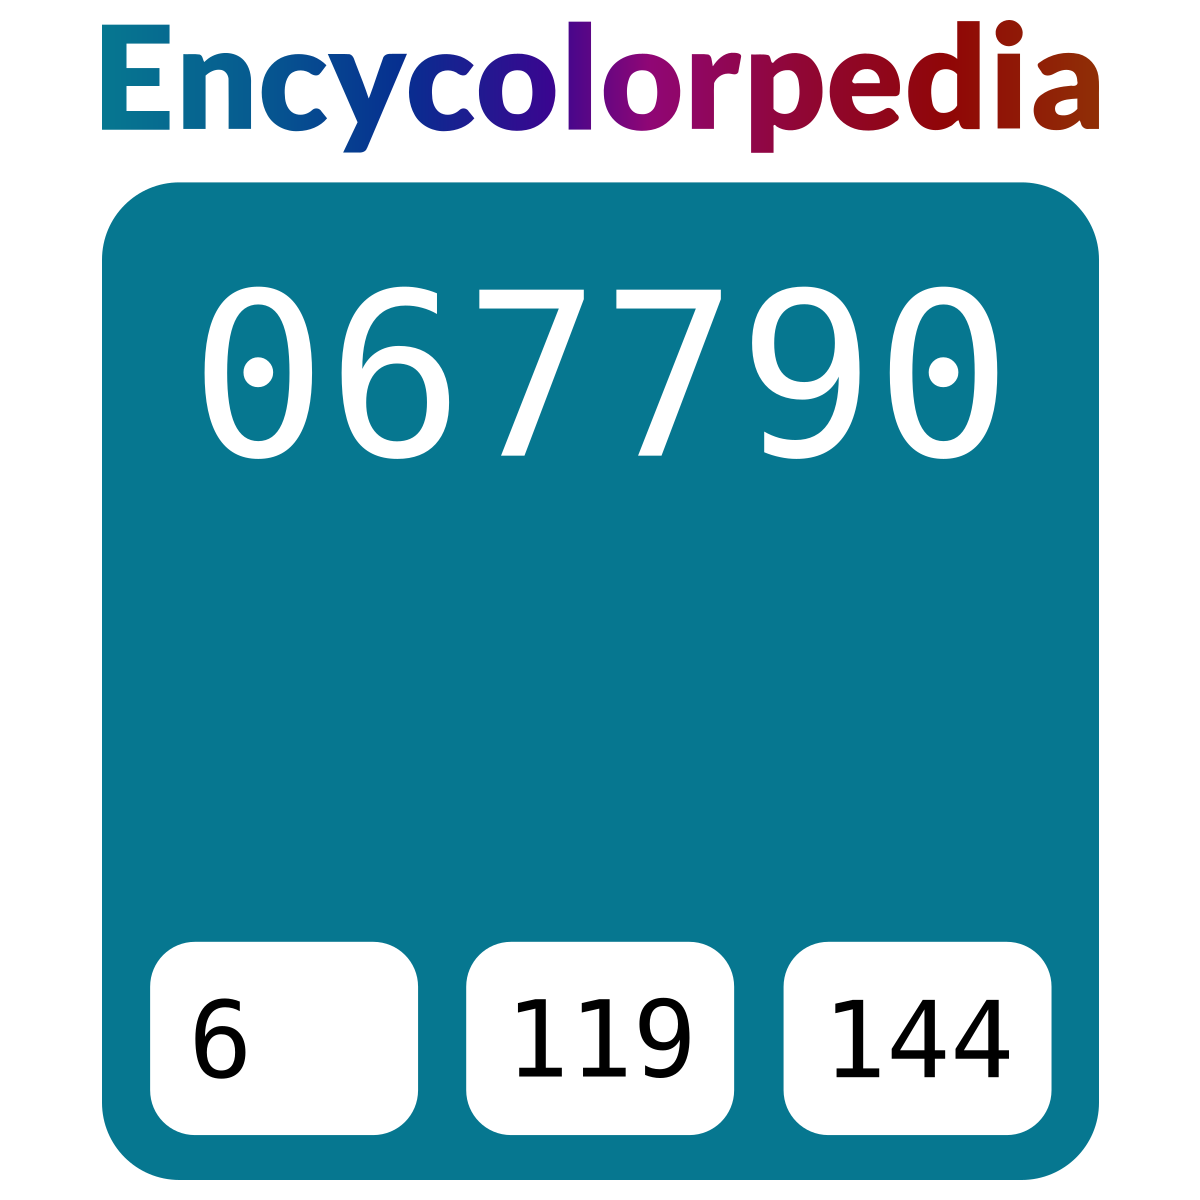 Bleu Paon 067790 Schémas De Couleurs Hexadécimal Et Peintures